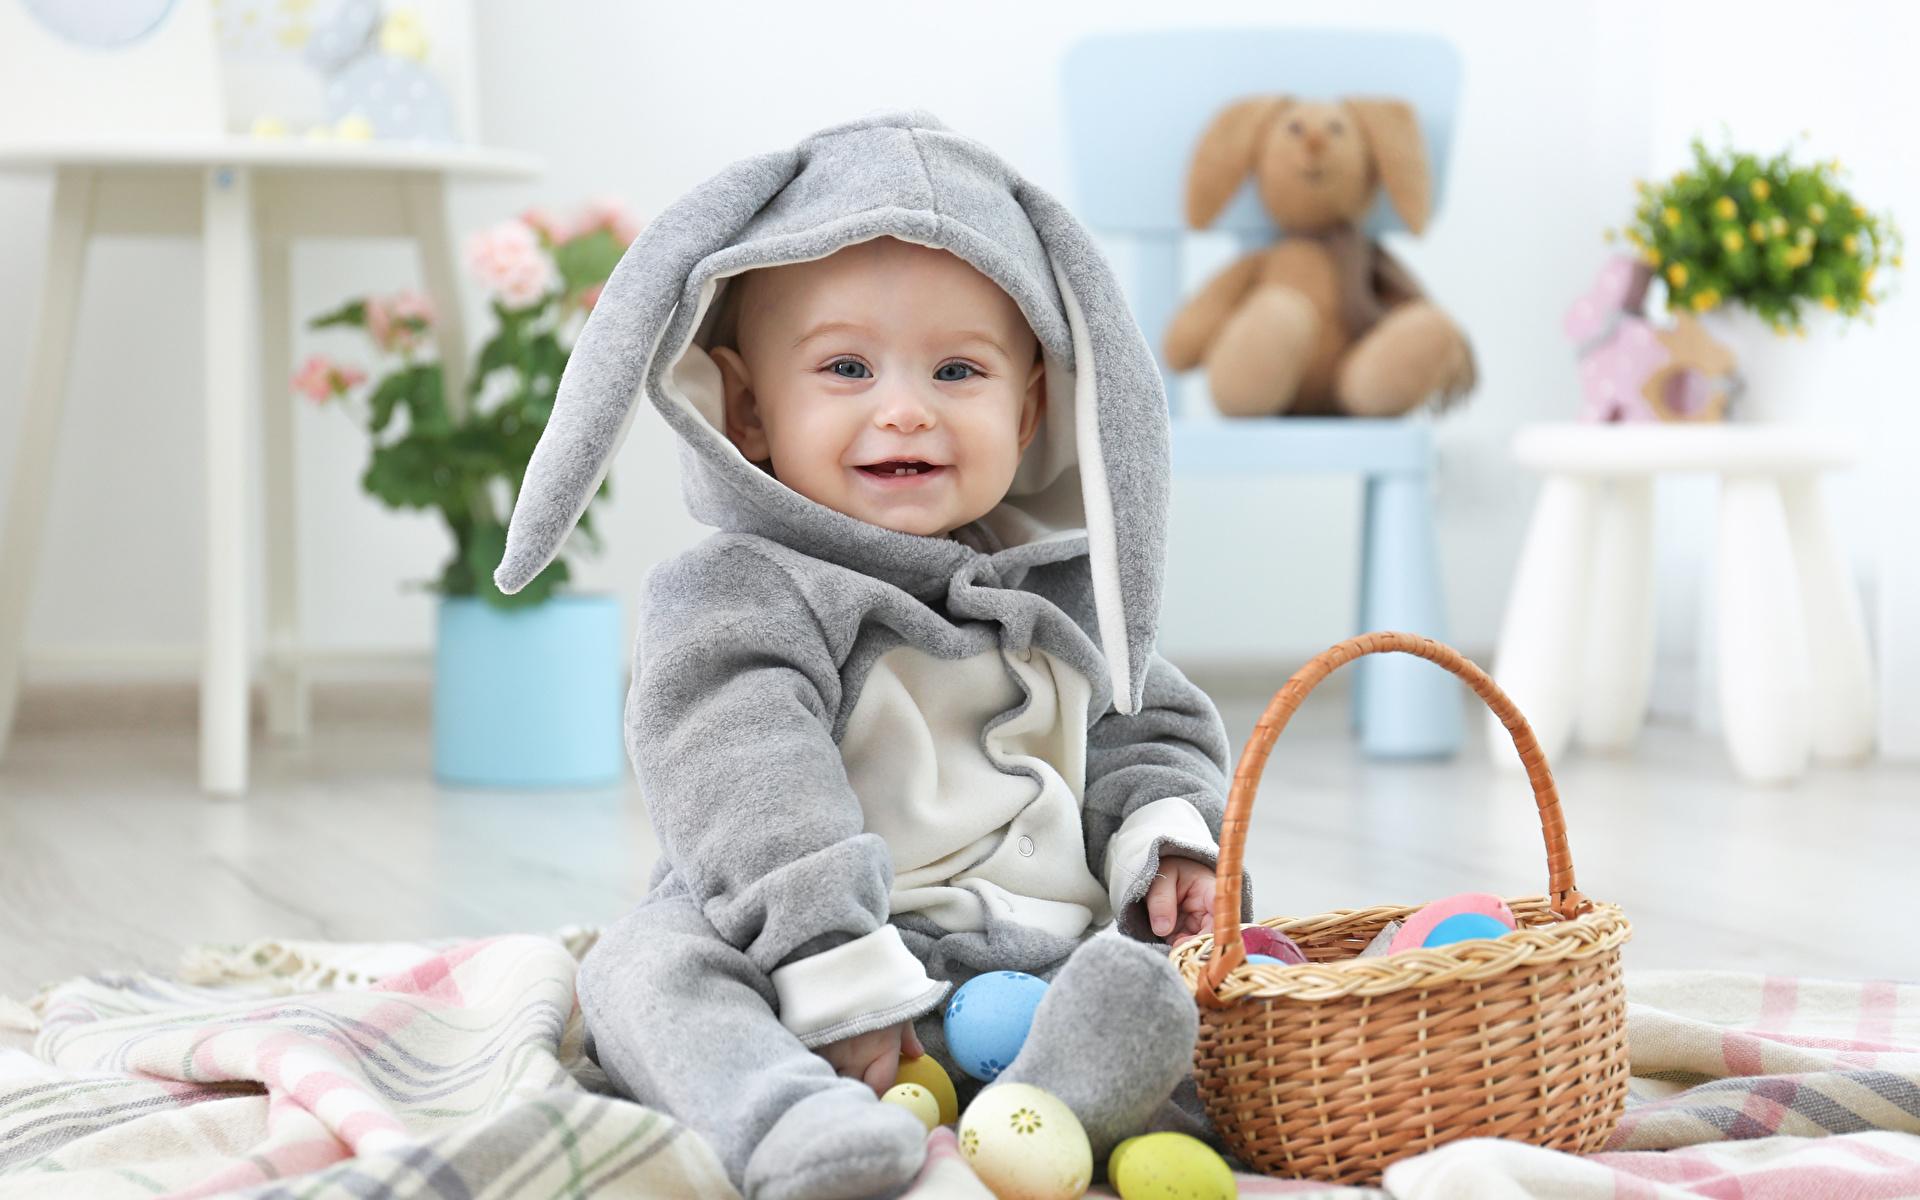 Картинки Пасха Кролики Младенцы Яйца ребёнок Корзинка Униформа Праздники 1920x1200 кролик младенец младенца грудной ребёнок яиц яйцо Дети яйцами Корзина корзины униформе